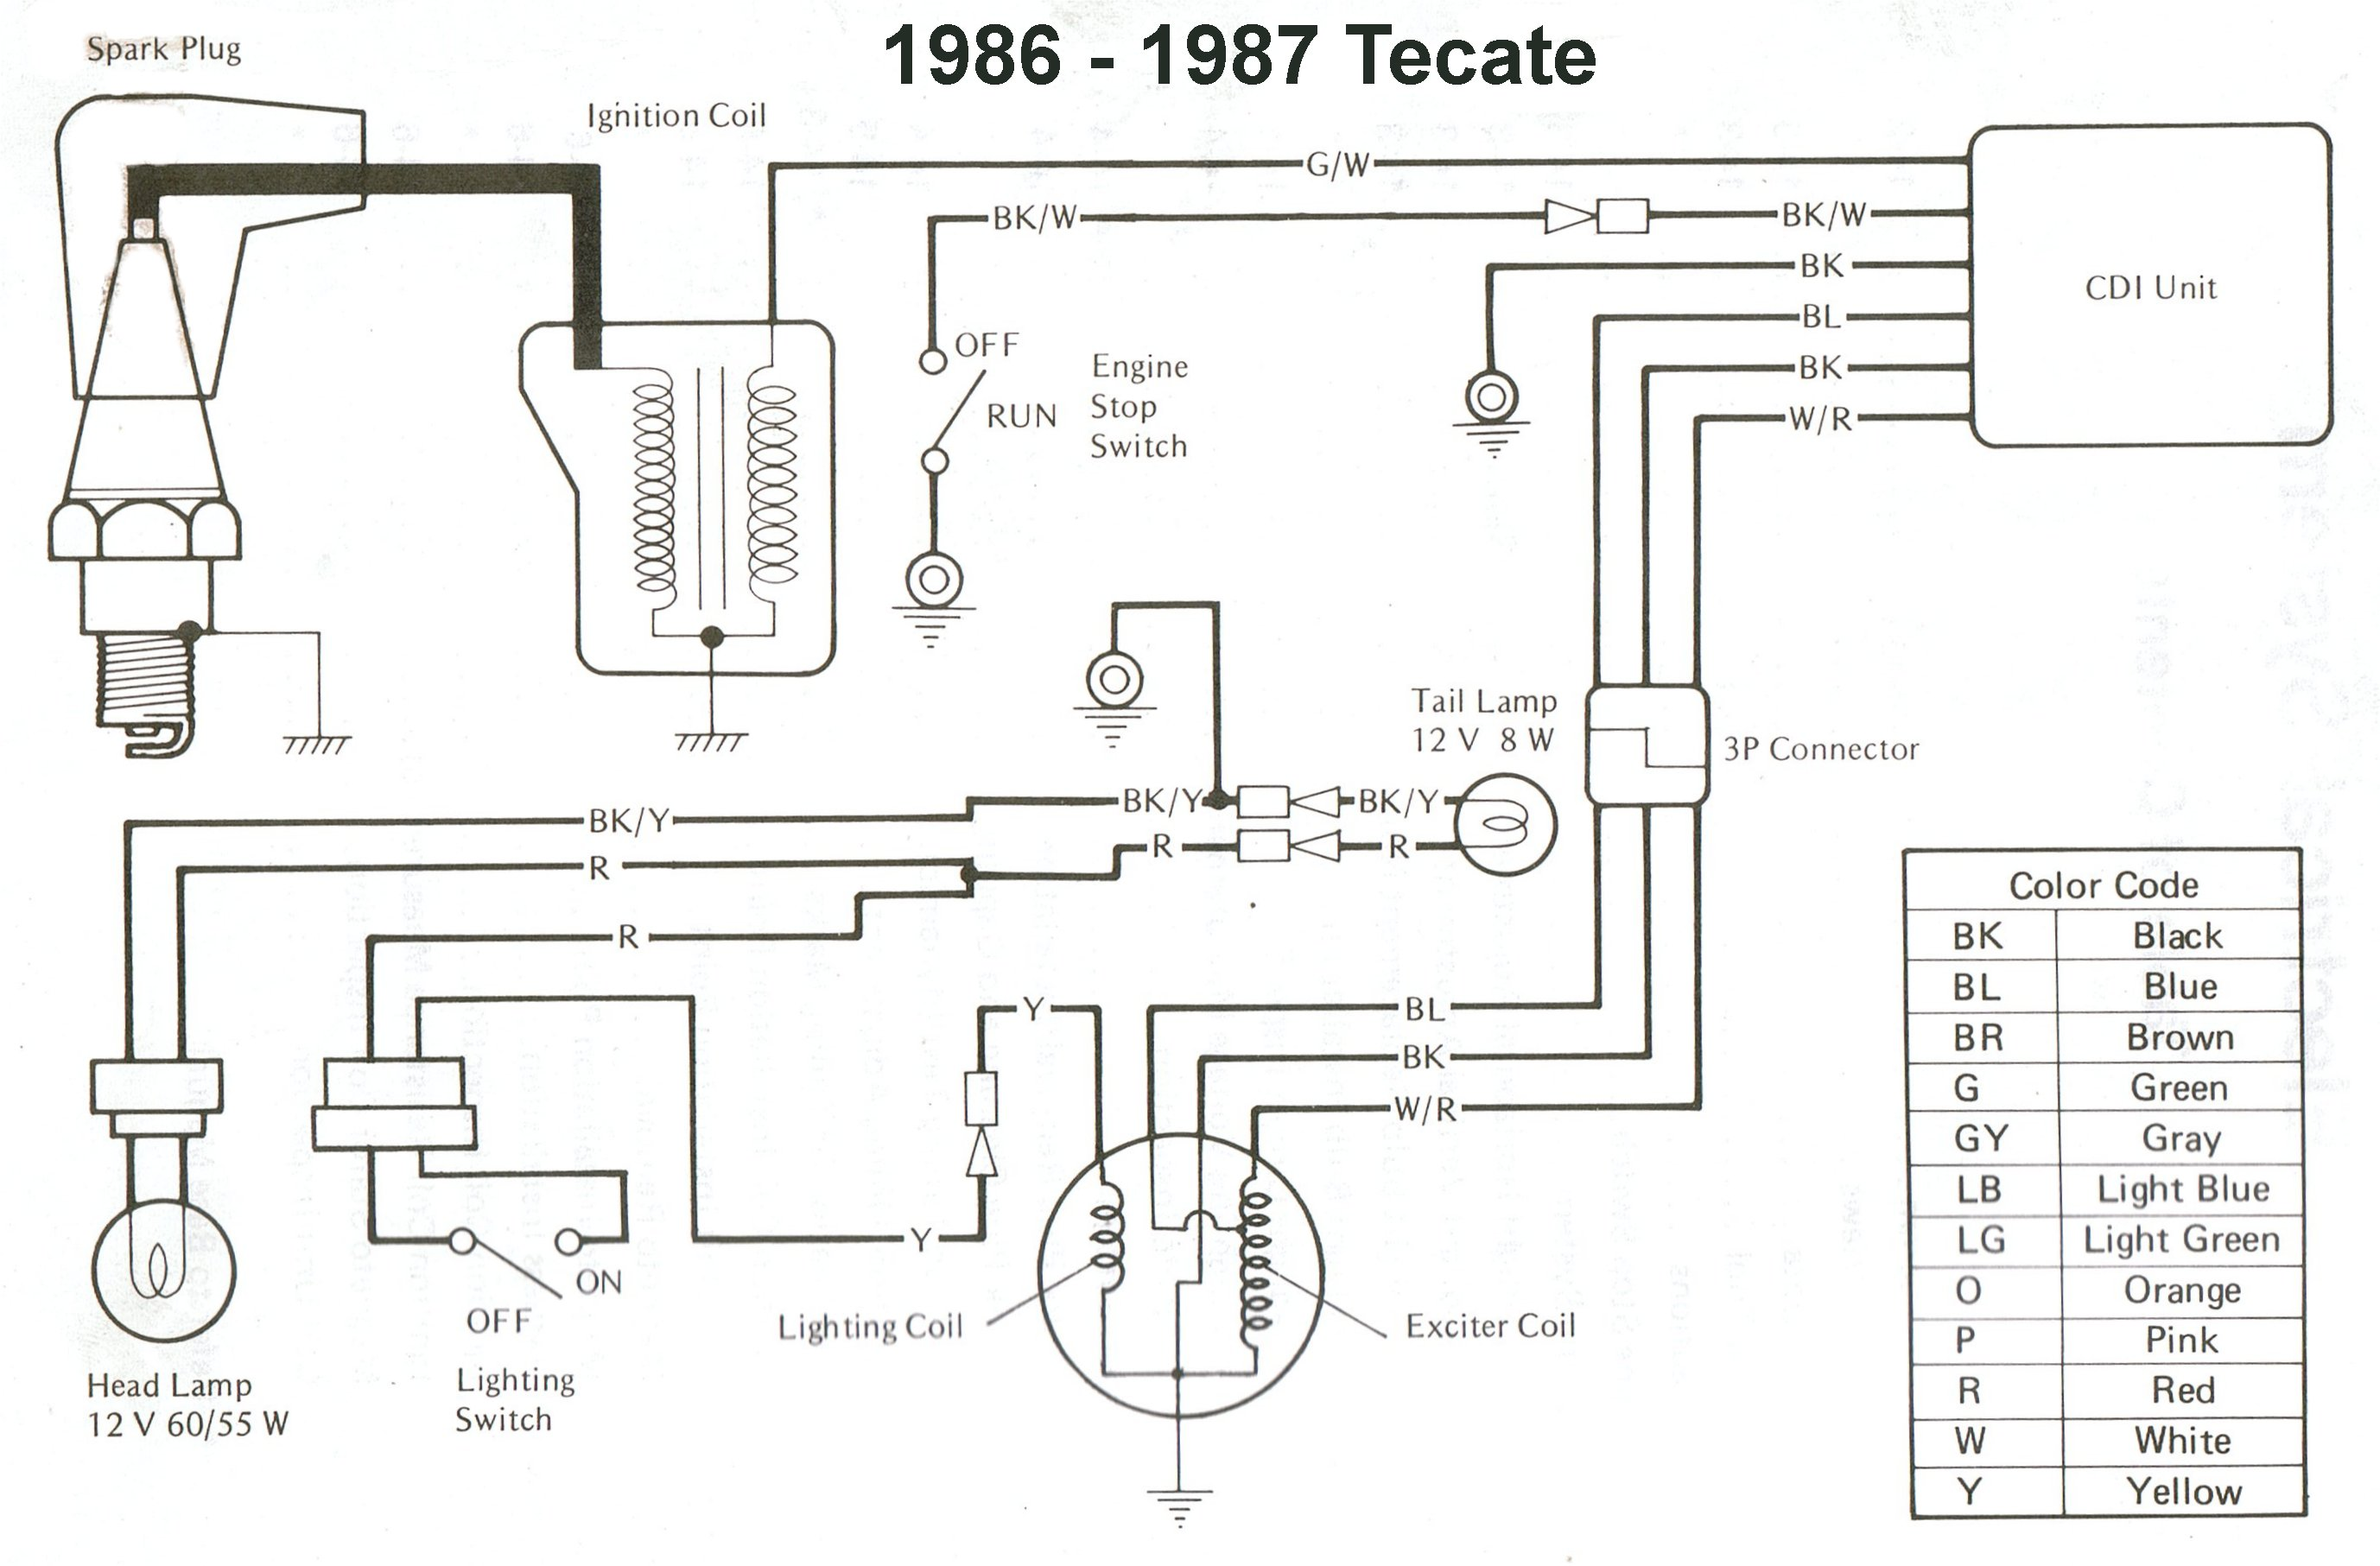 1986 Honda Xr600r Wiring Diagram further 2013 Honda Crf450r Wiring Diagram besides How Does An Engine Work Diagram in addition 1986 Xr600r Wiring Diagram as well  on 1027685 xr200 lights